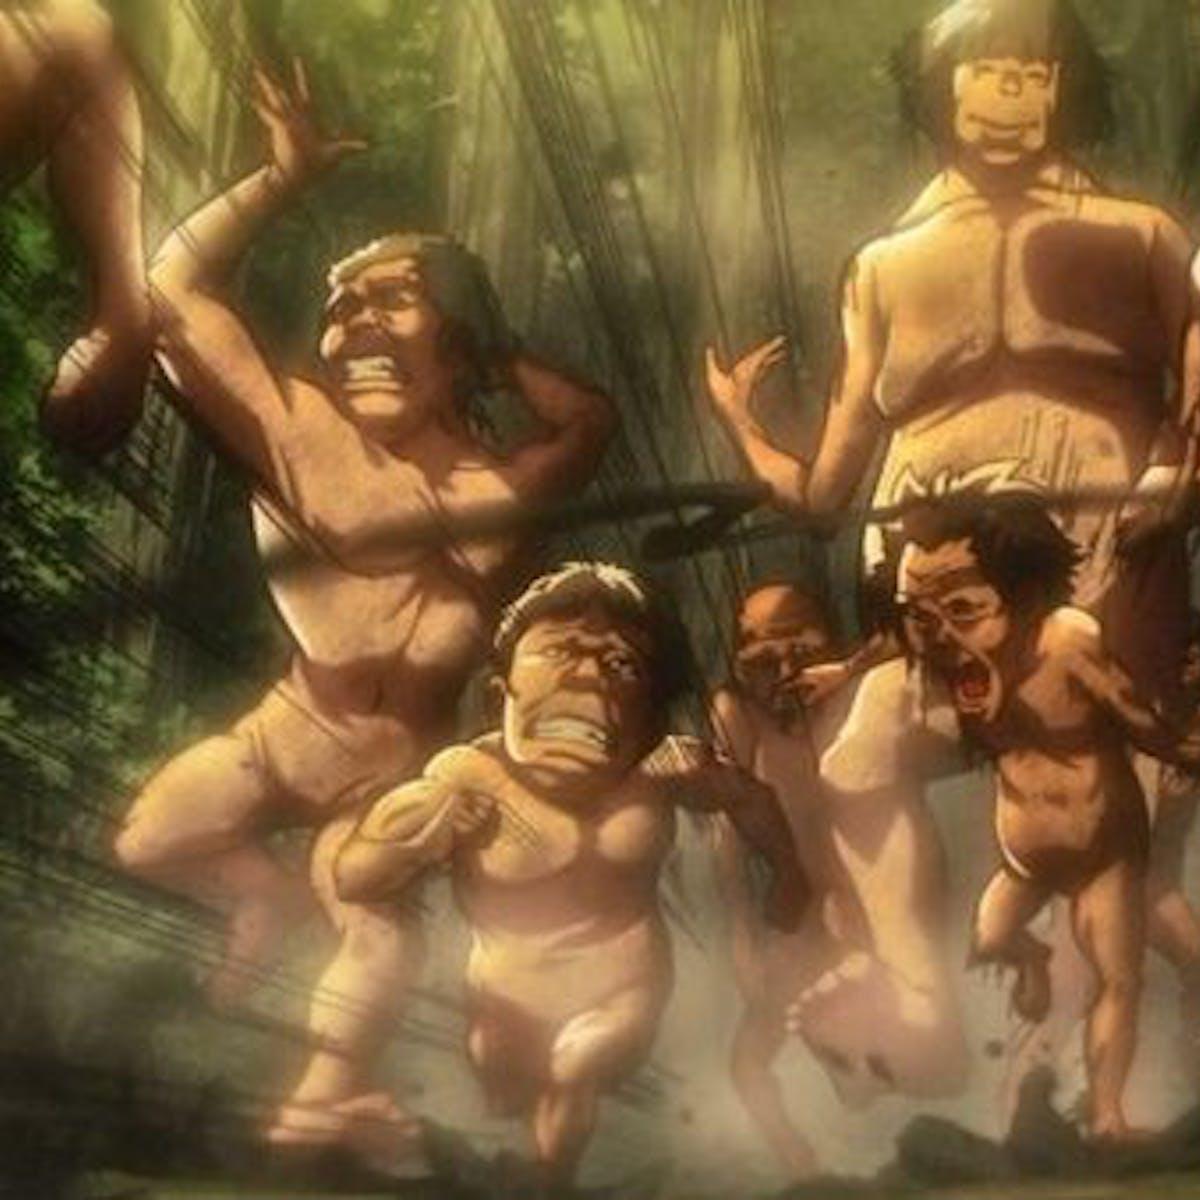 Attack on Titan' Season 3 Theories: Where Are All the Titans